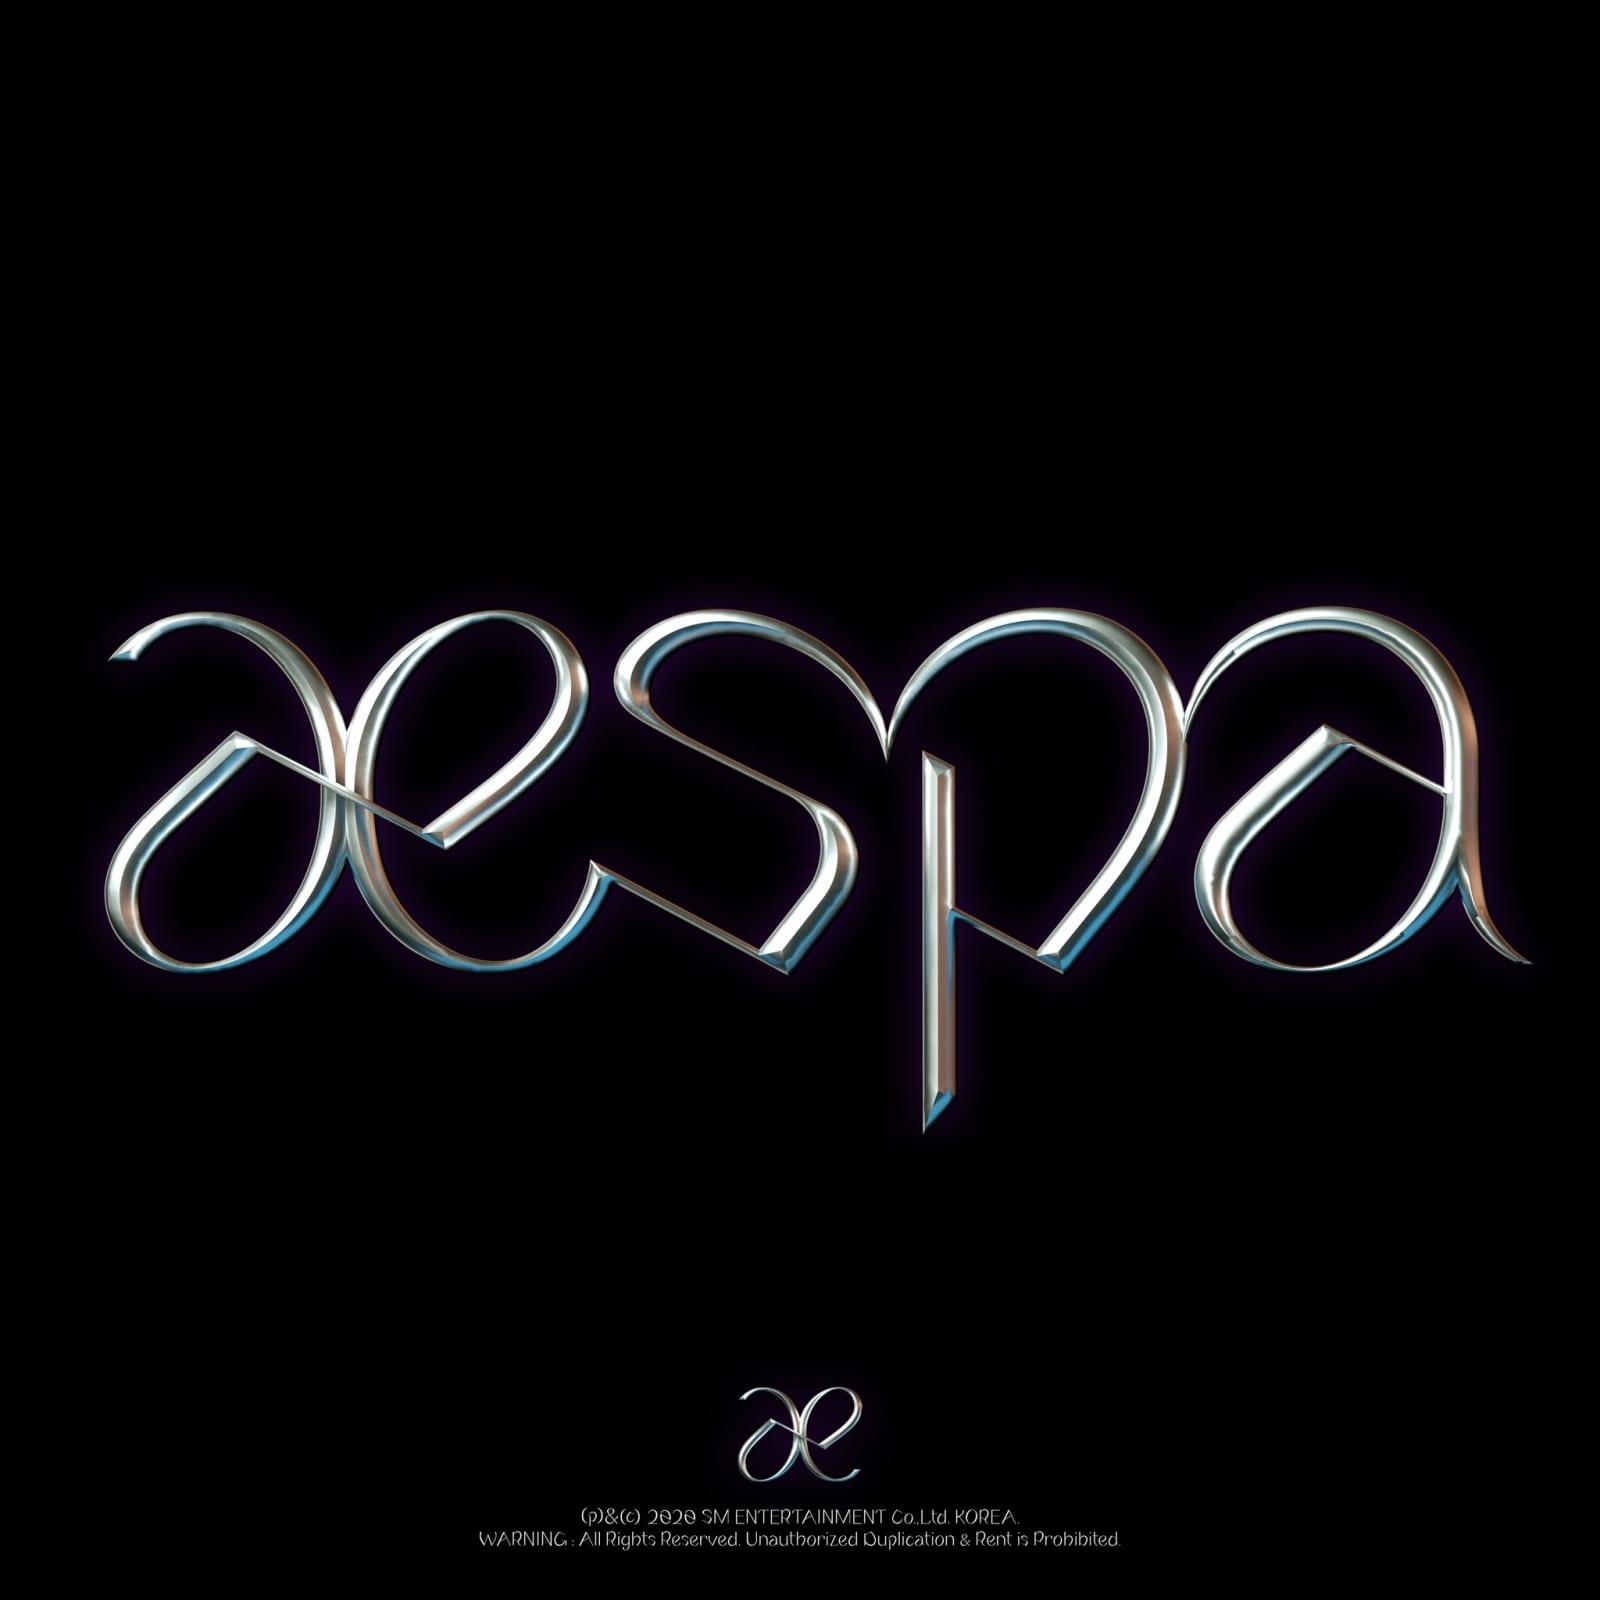 logo aespa yang dirilis SM Entertainment